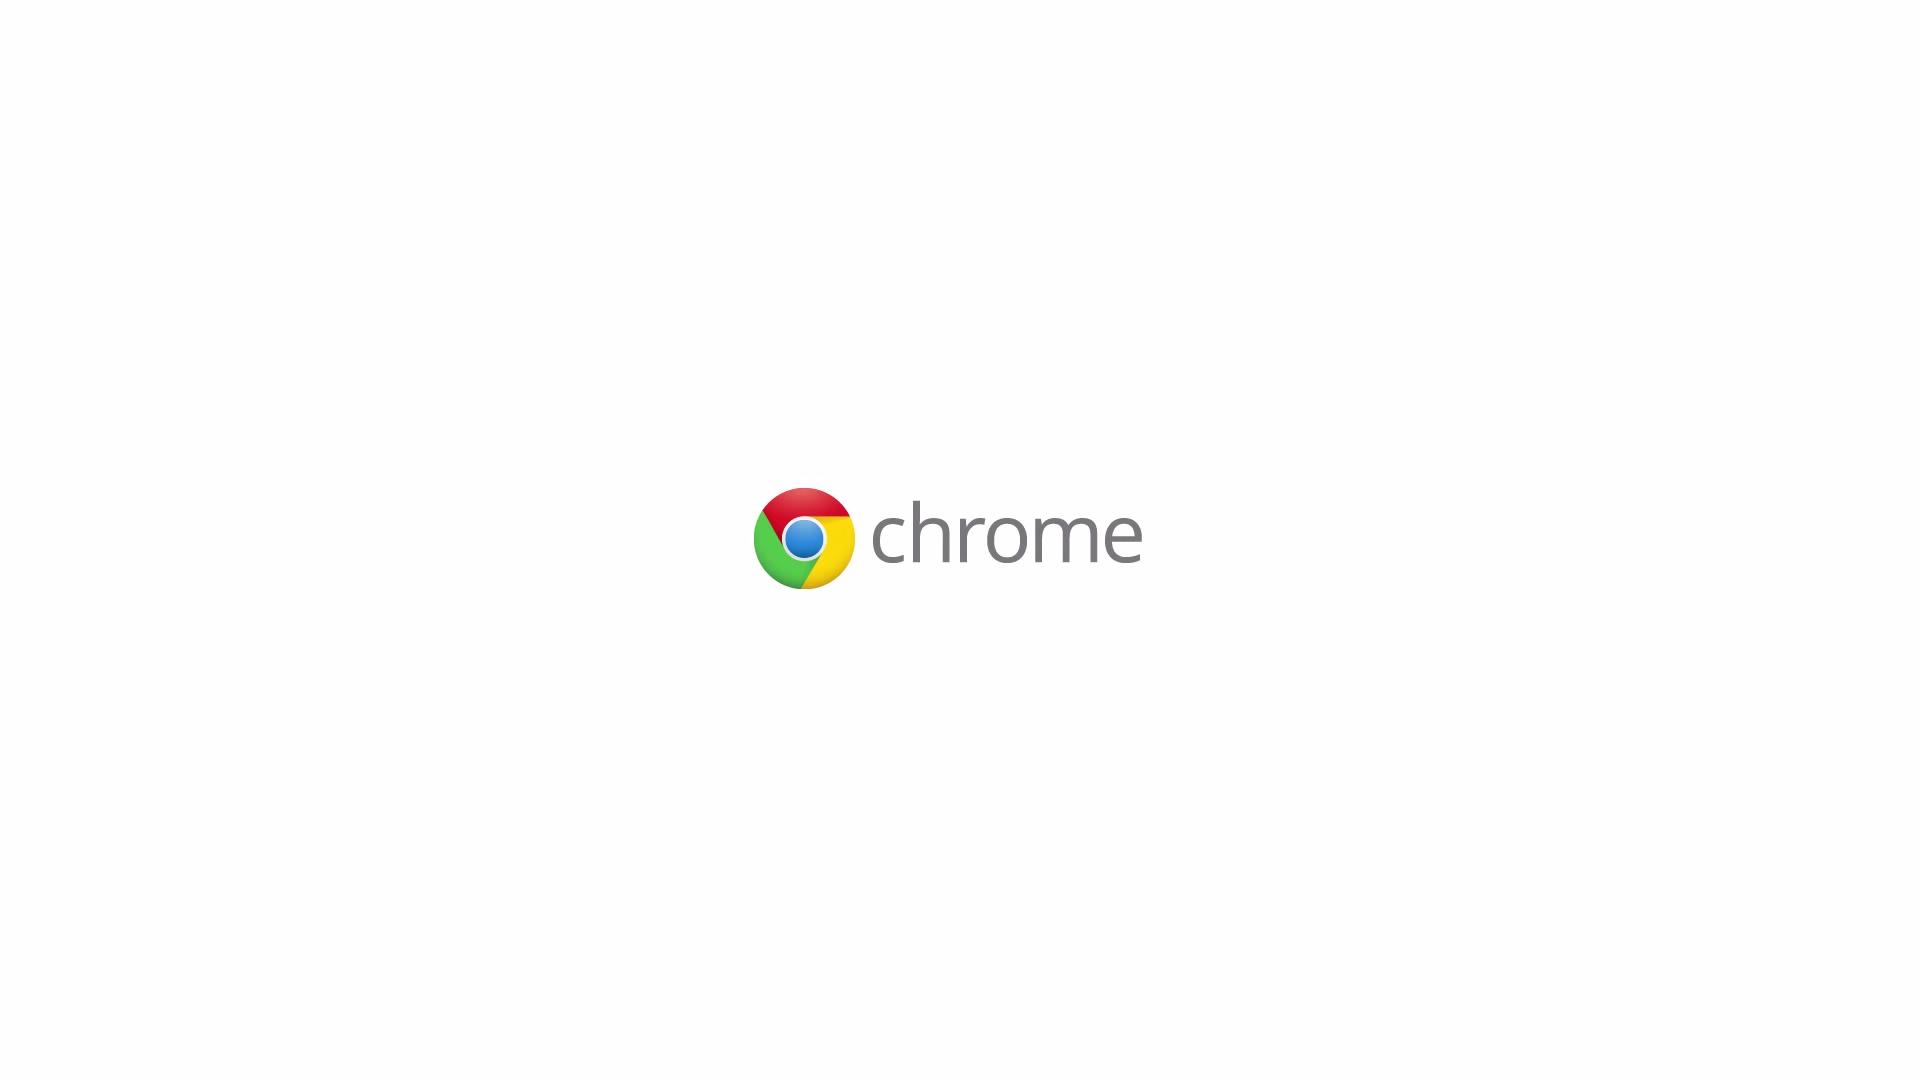 Google Chrome | Windows 10